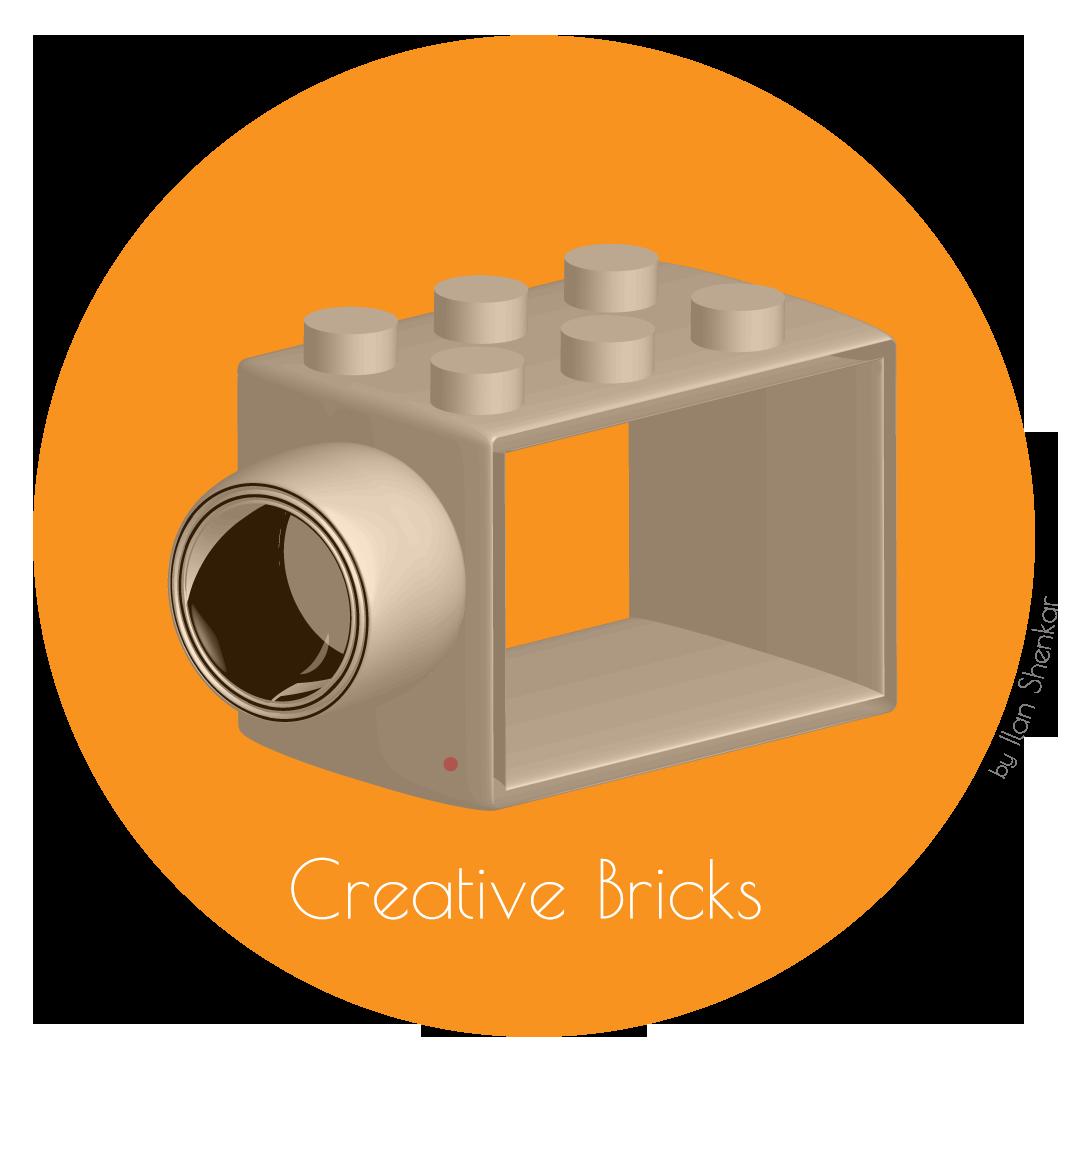 Creative Bricks